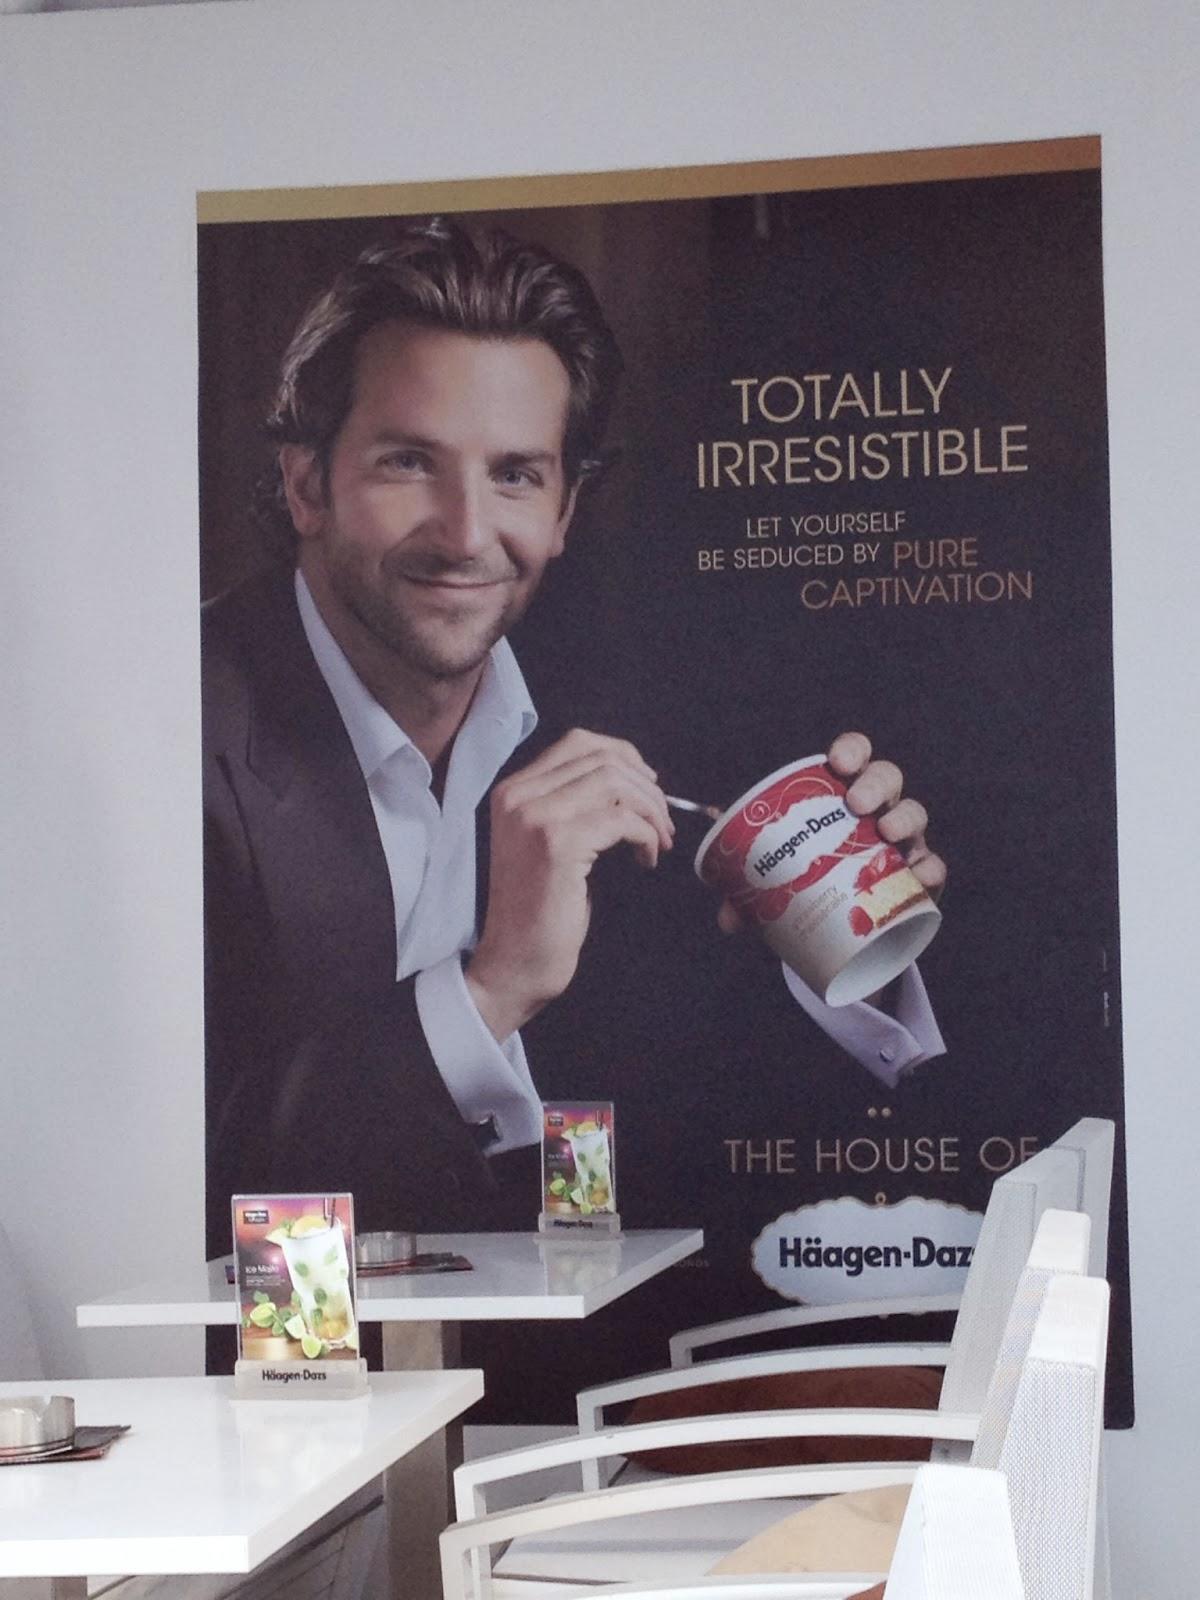 Mykonos - Bradley Cooper loves Haagen-Dazs